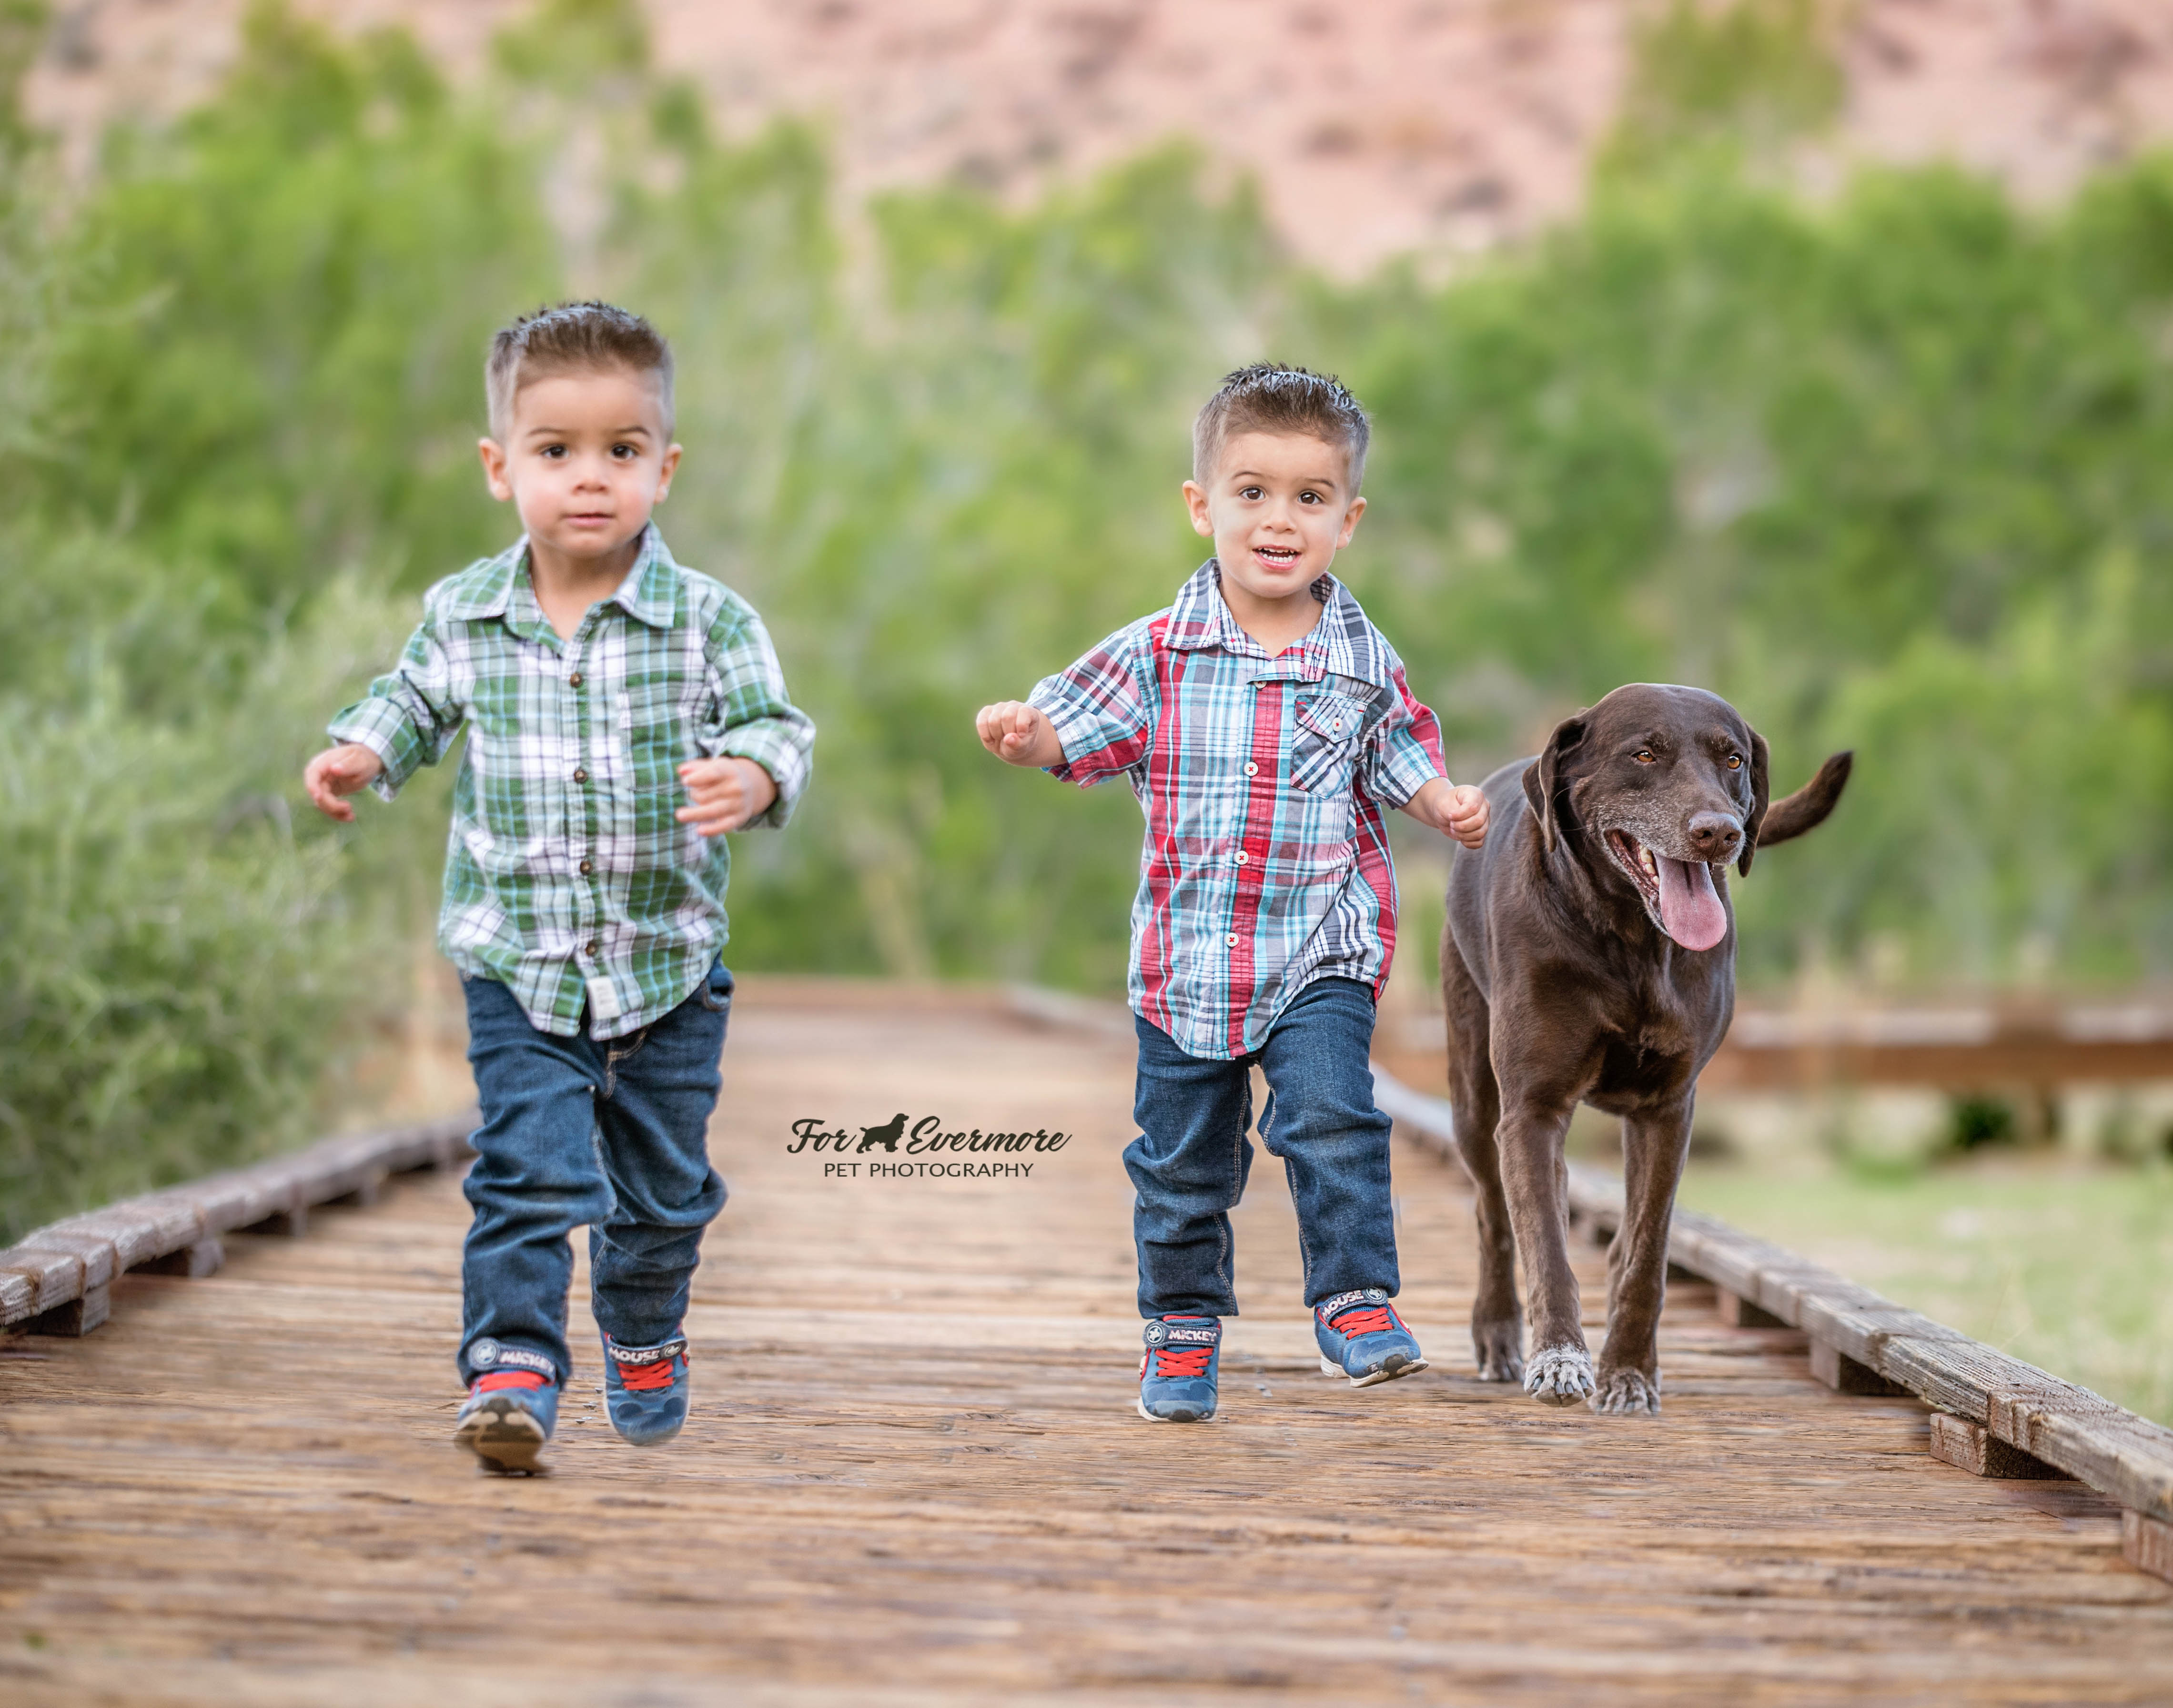 The boys and their dog